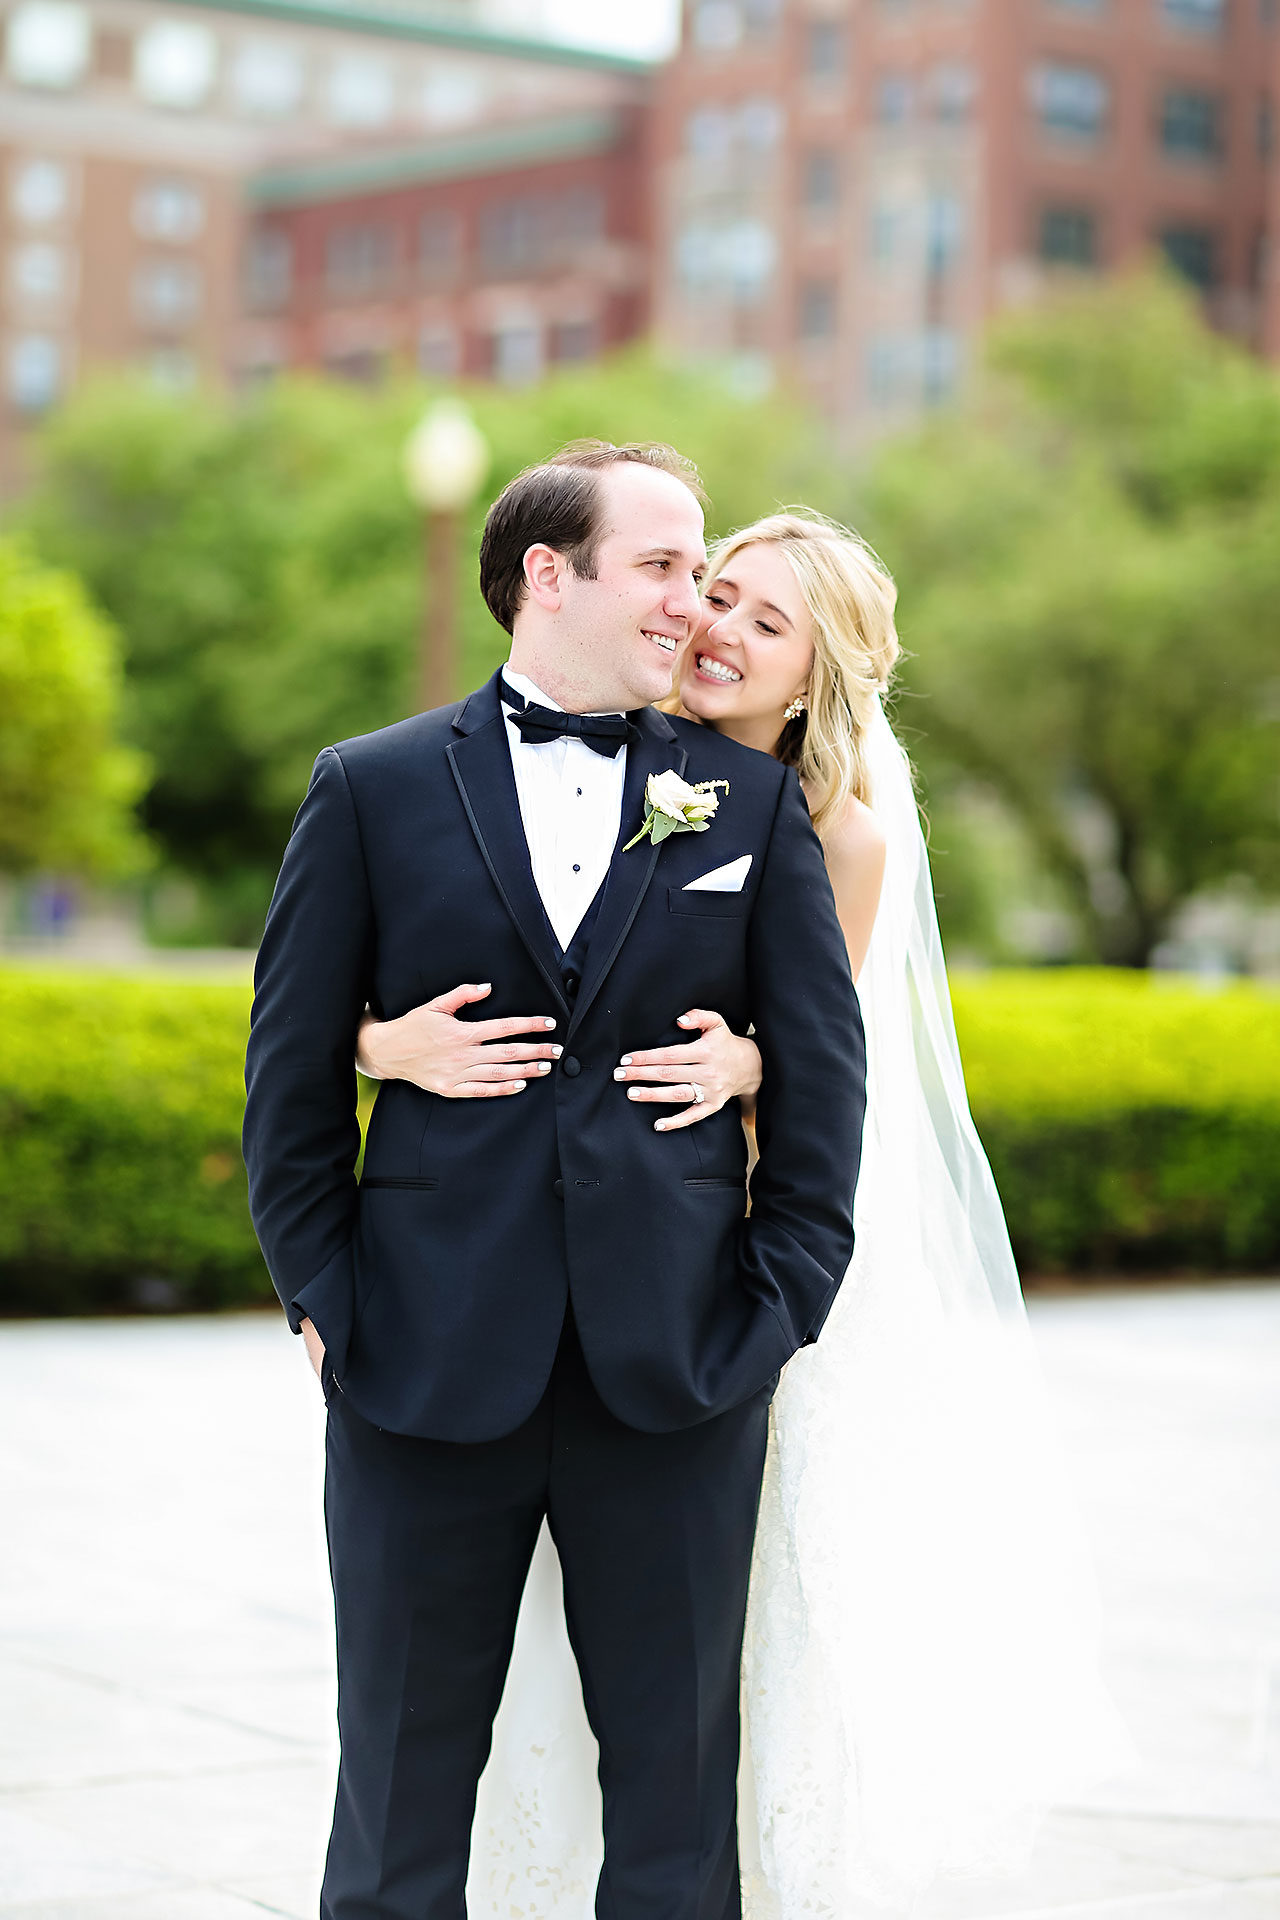 Allison Jeff Union Station Crowne Plaza Indianapolis wedding 201